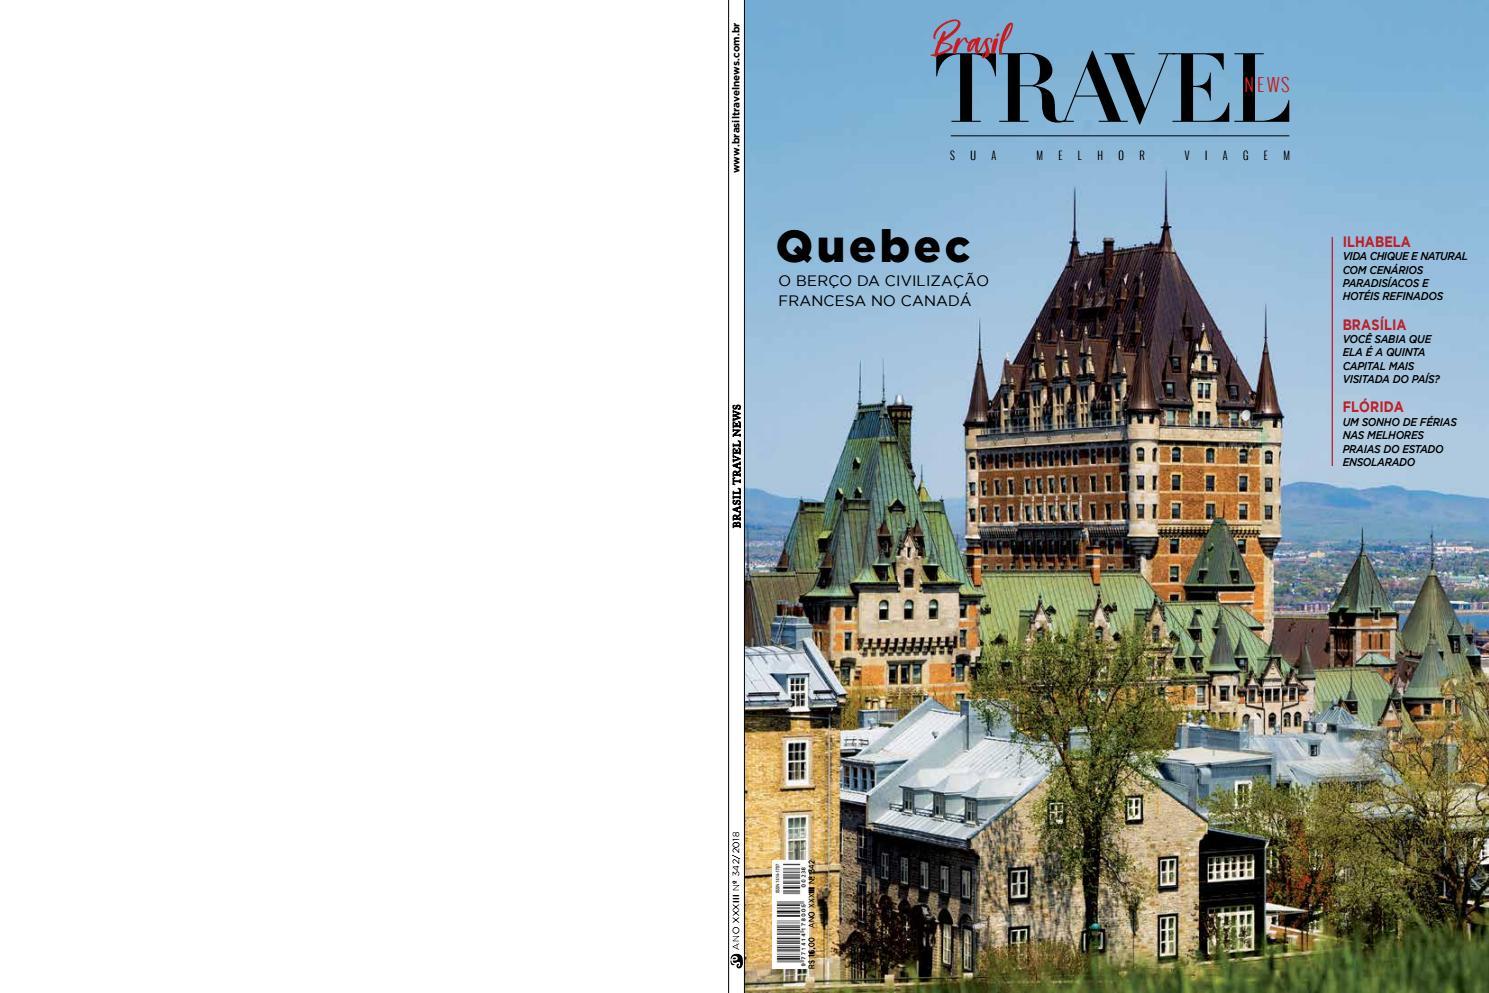 5e7cdfa44a6 BTN 342 - Quebec by Brasil Travel News - issuu